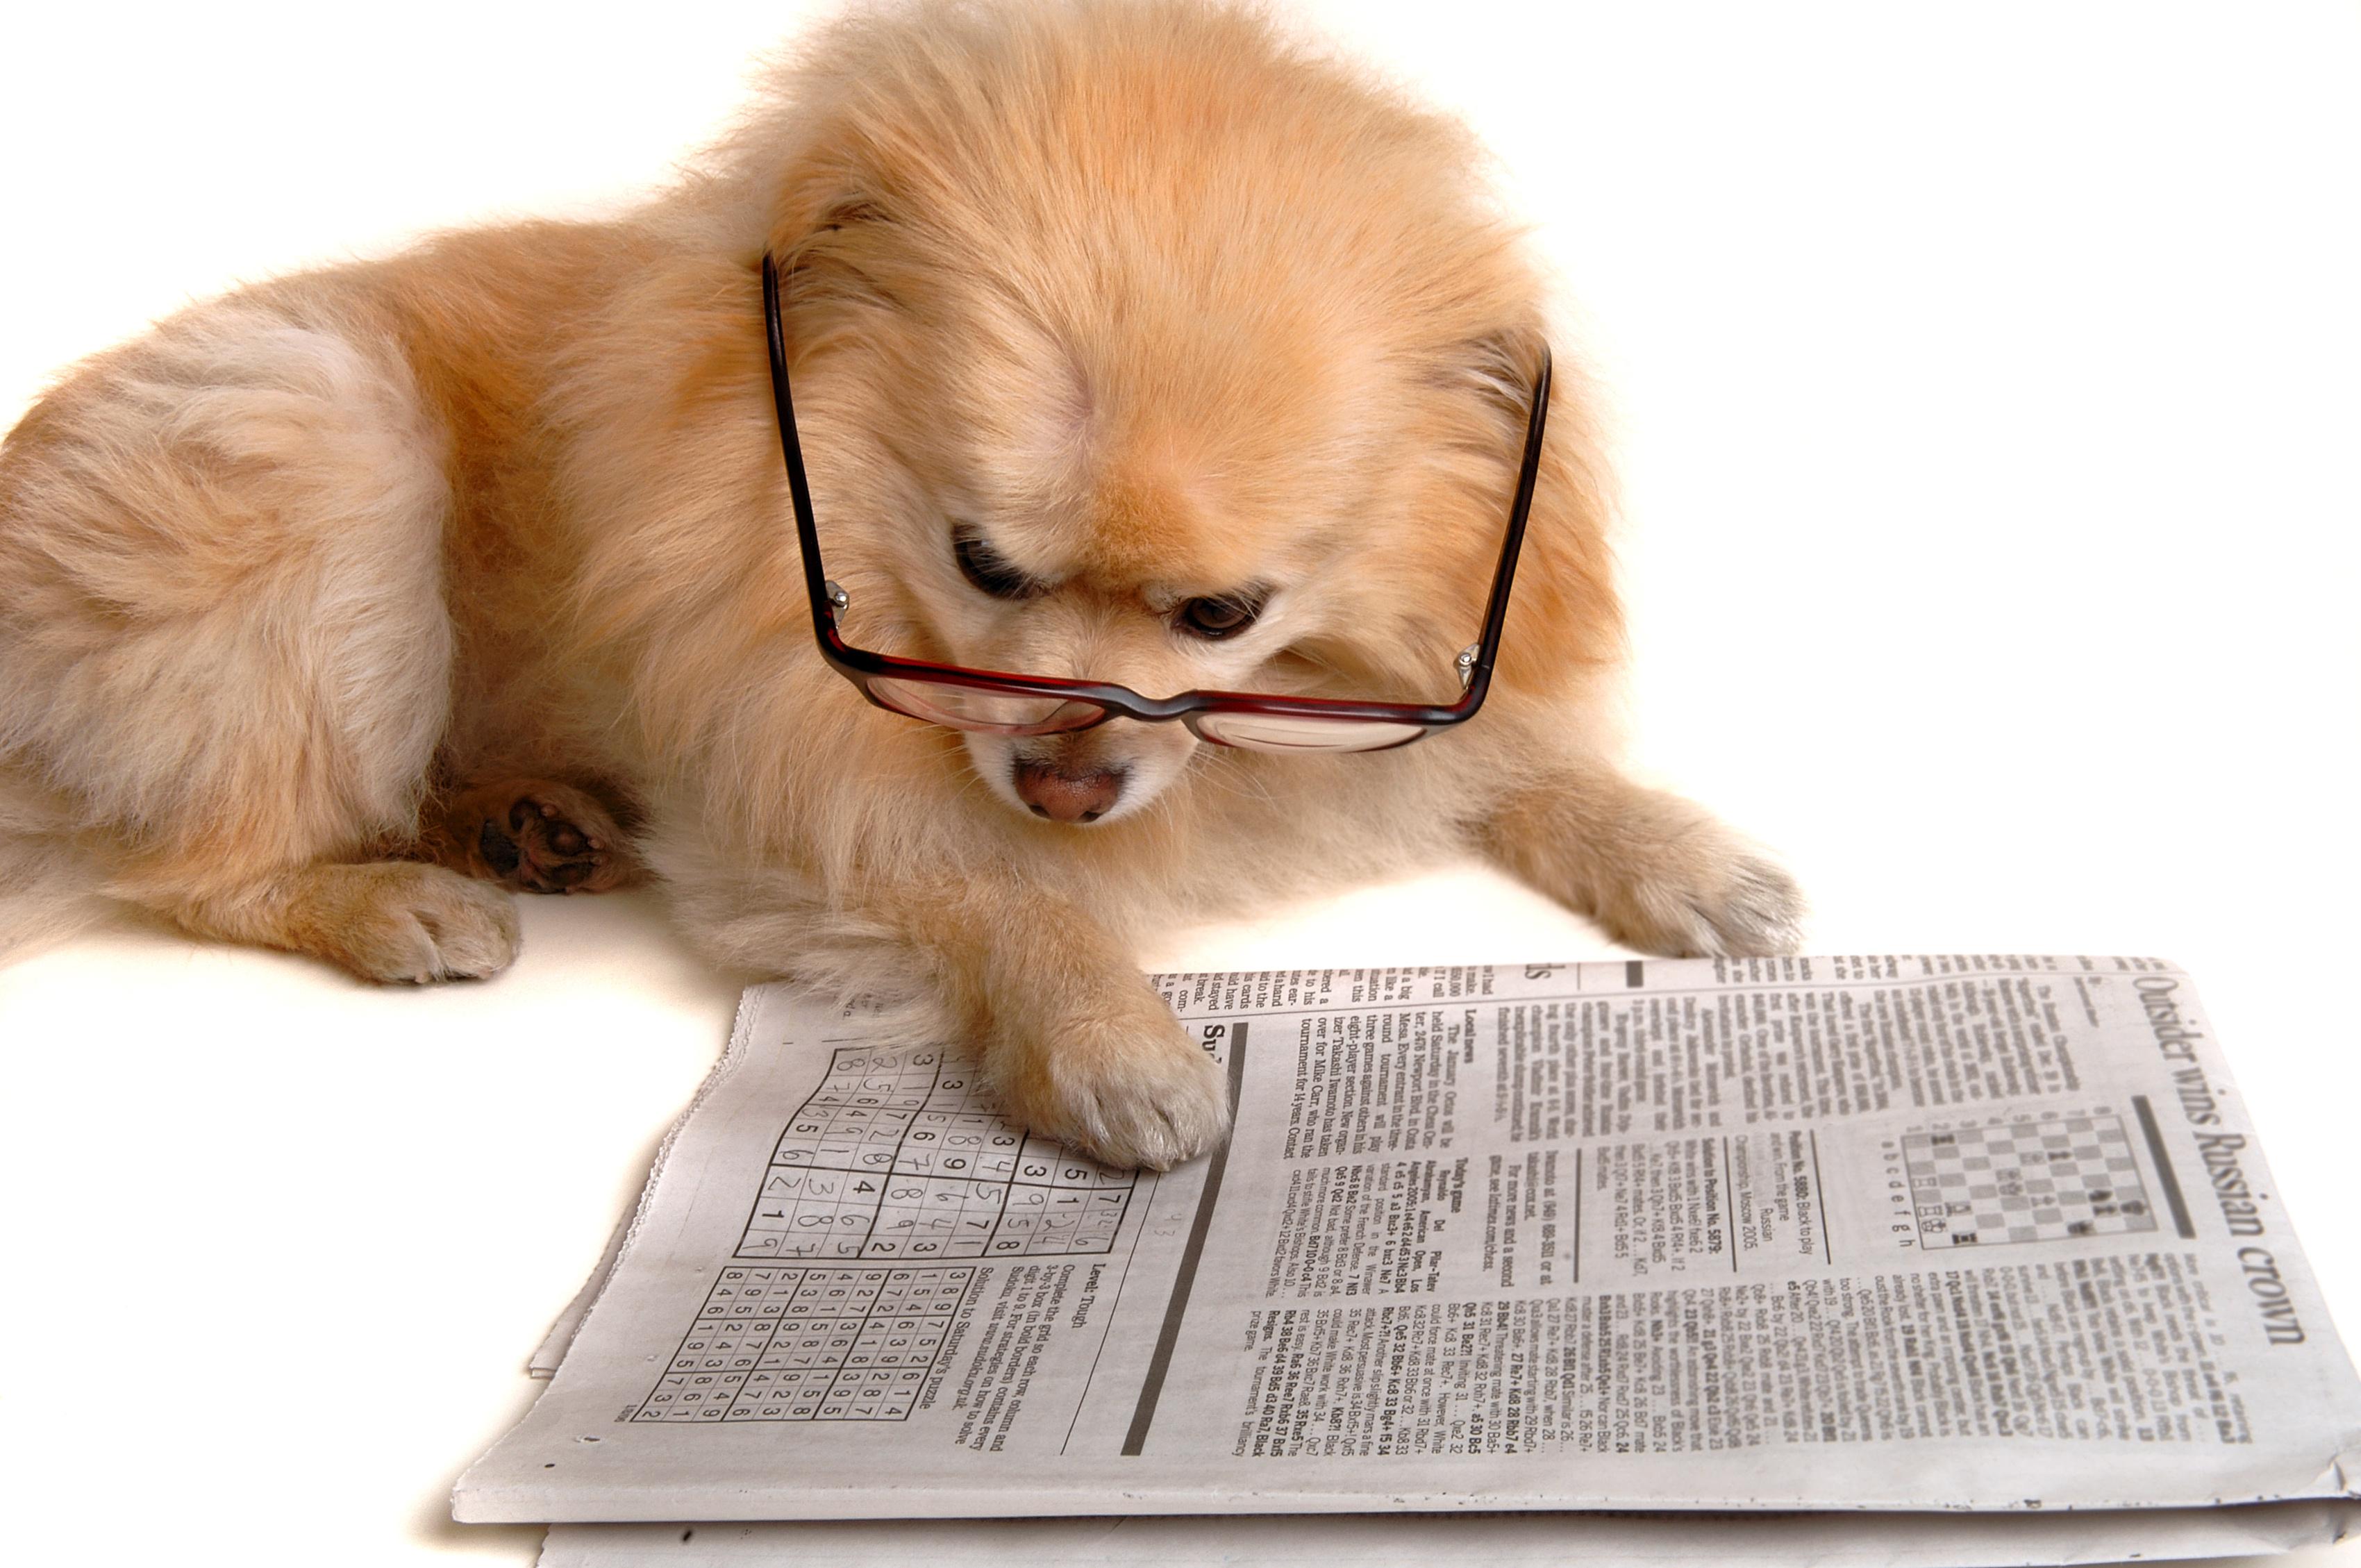 Grafik therapiehunde, texten-im-internet